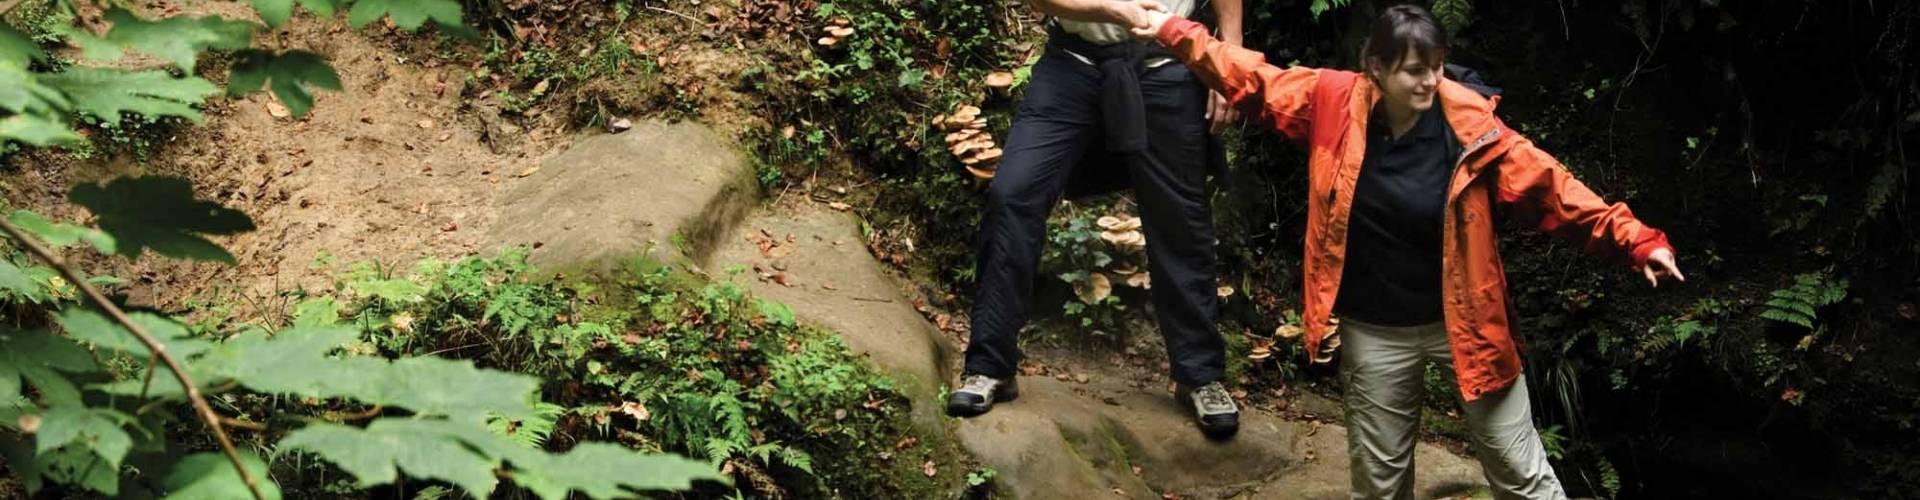 rondwandelroute naturwanderpark delux felsenweg 2 foto 1